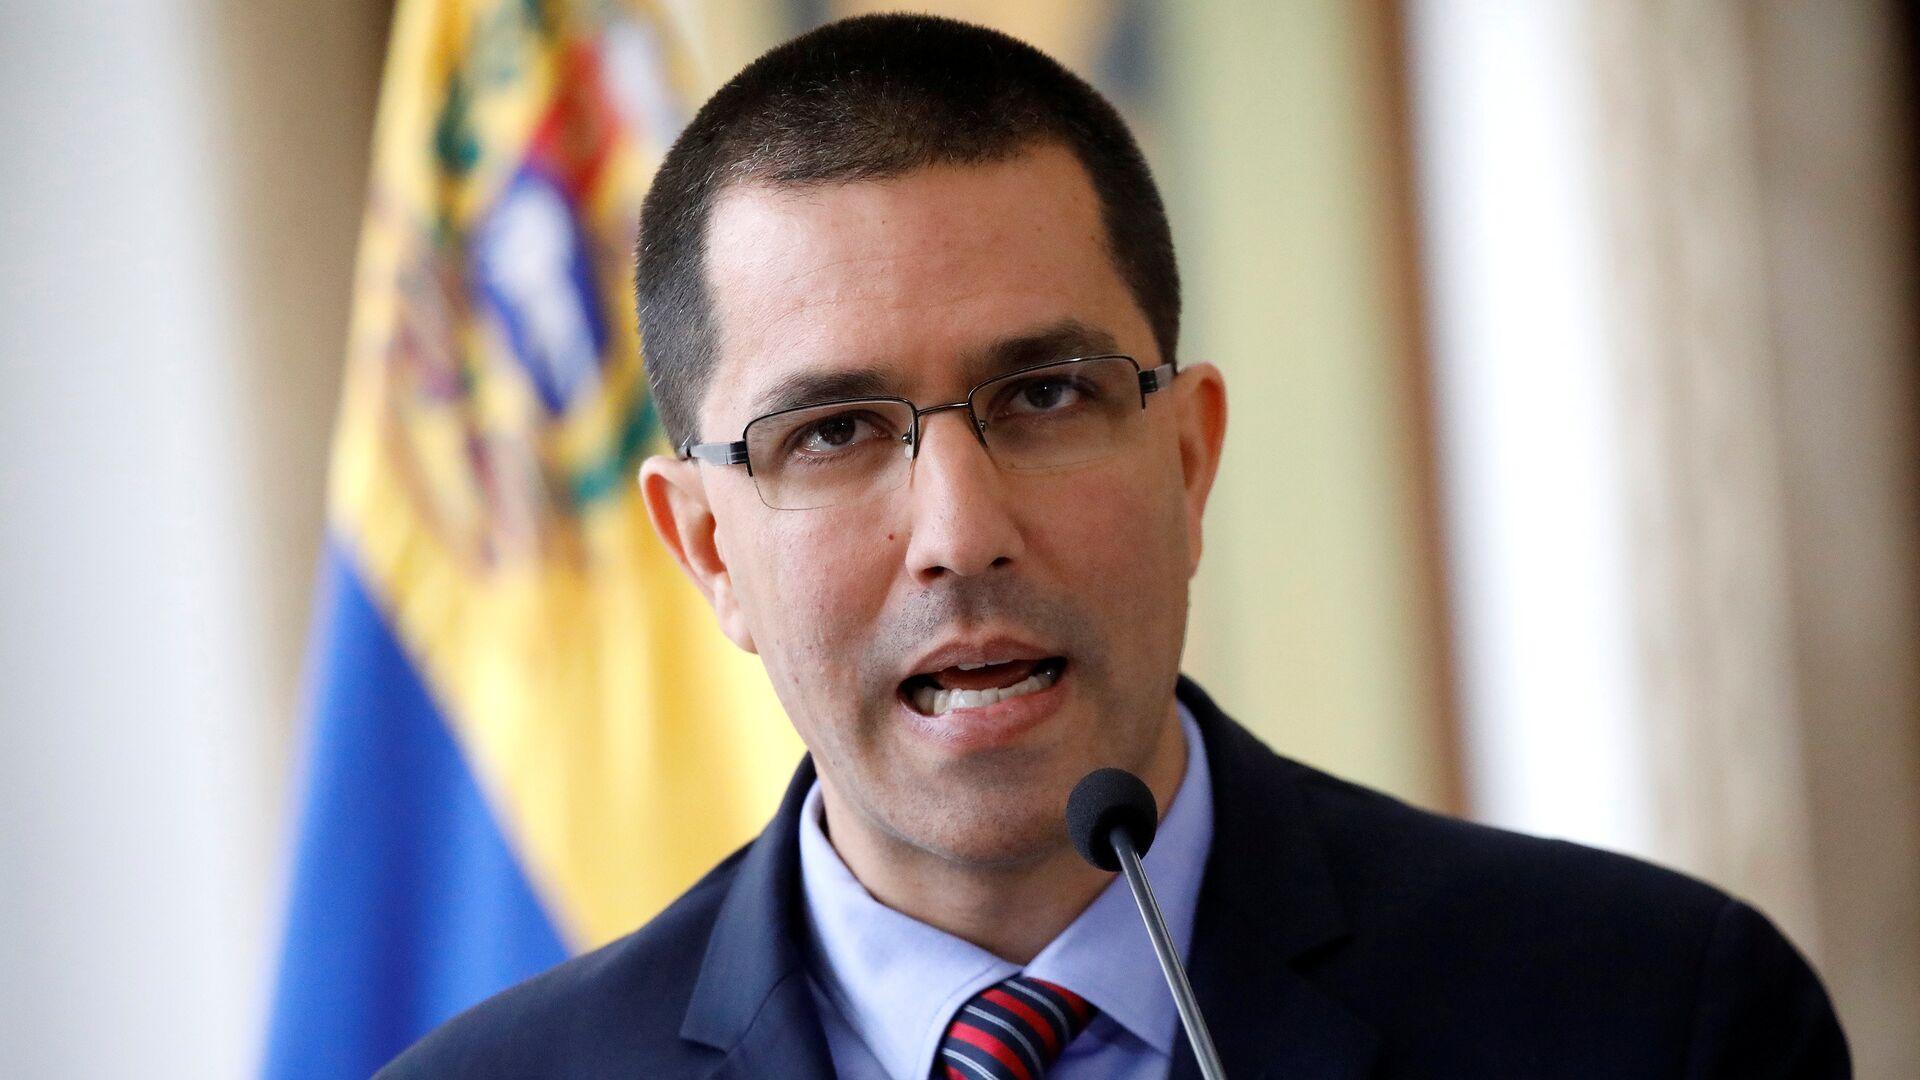 Jorge Arreaza, el canciller de Venezuela - Sputnik Mundo, 1920, 04.02.2021